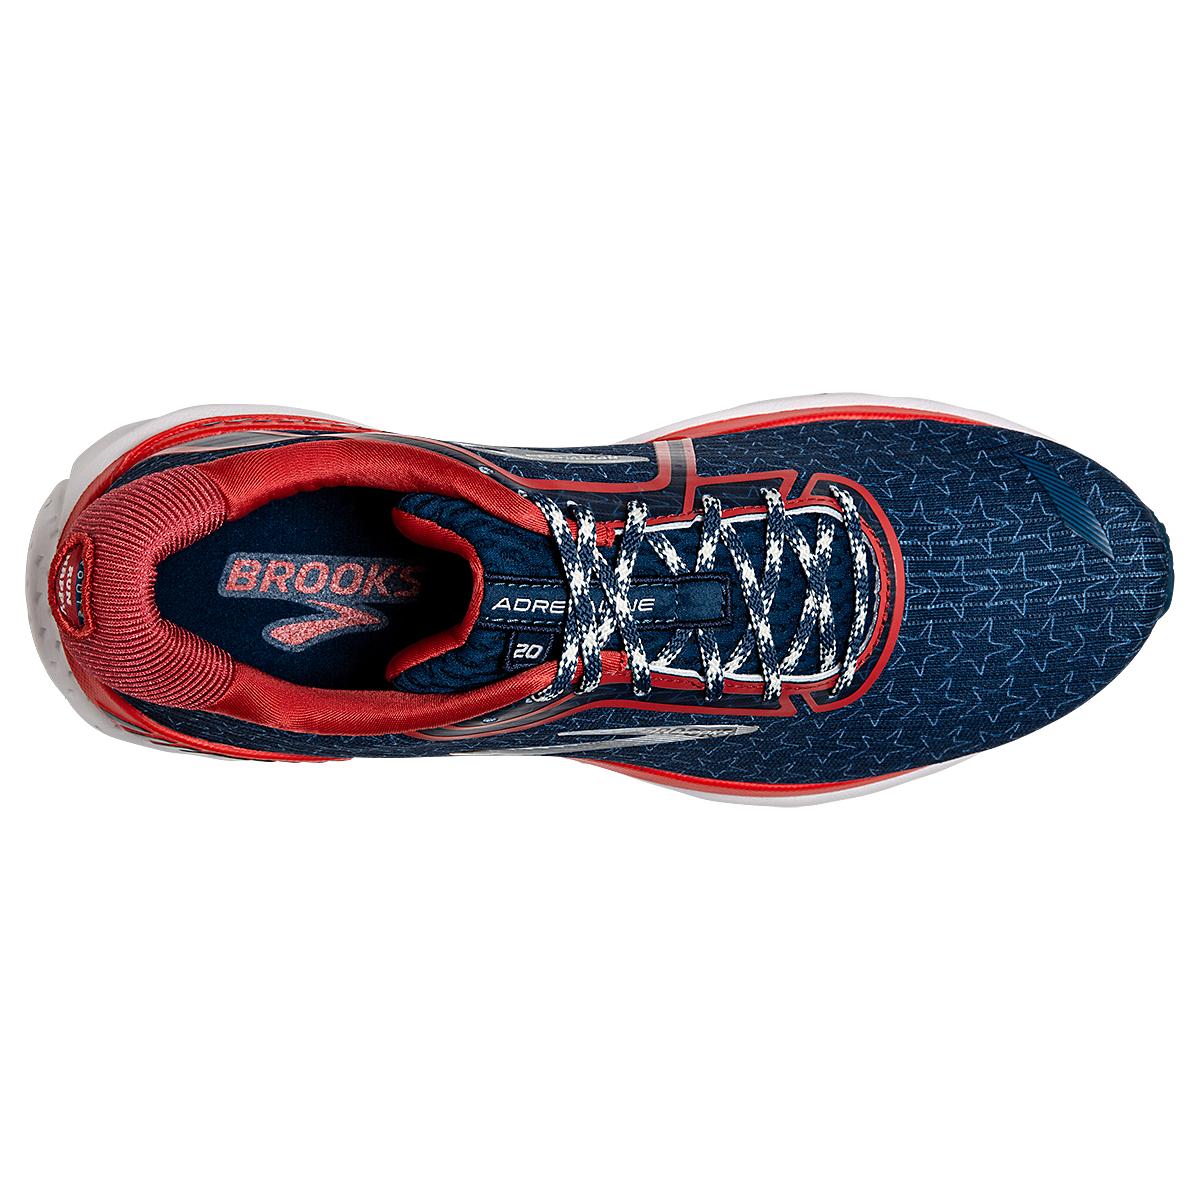 Men's Brooks Adrenaline GTS 20 Running Shoe - Color: Gibraltar/Red/White - Size: 7 - Width: Regular, Gibraltar/Red/White, large, image 2